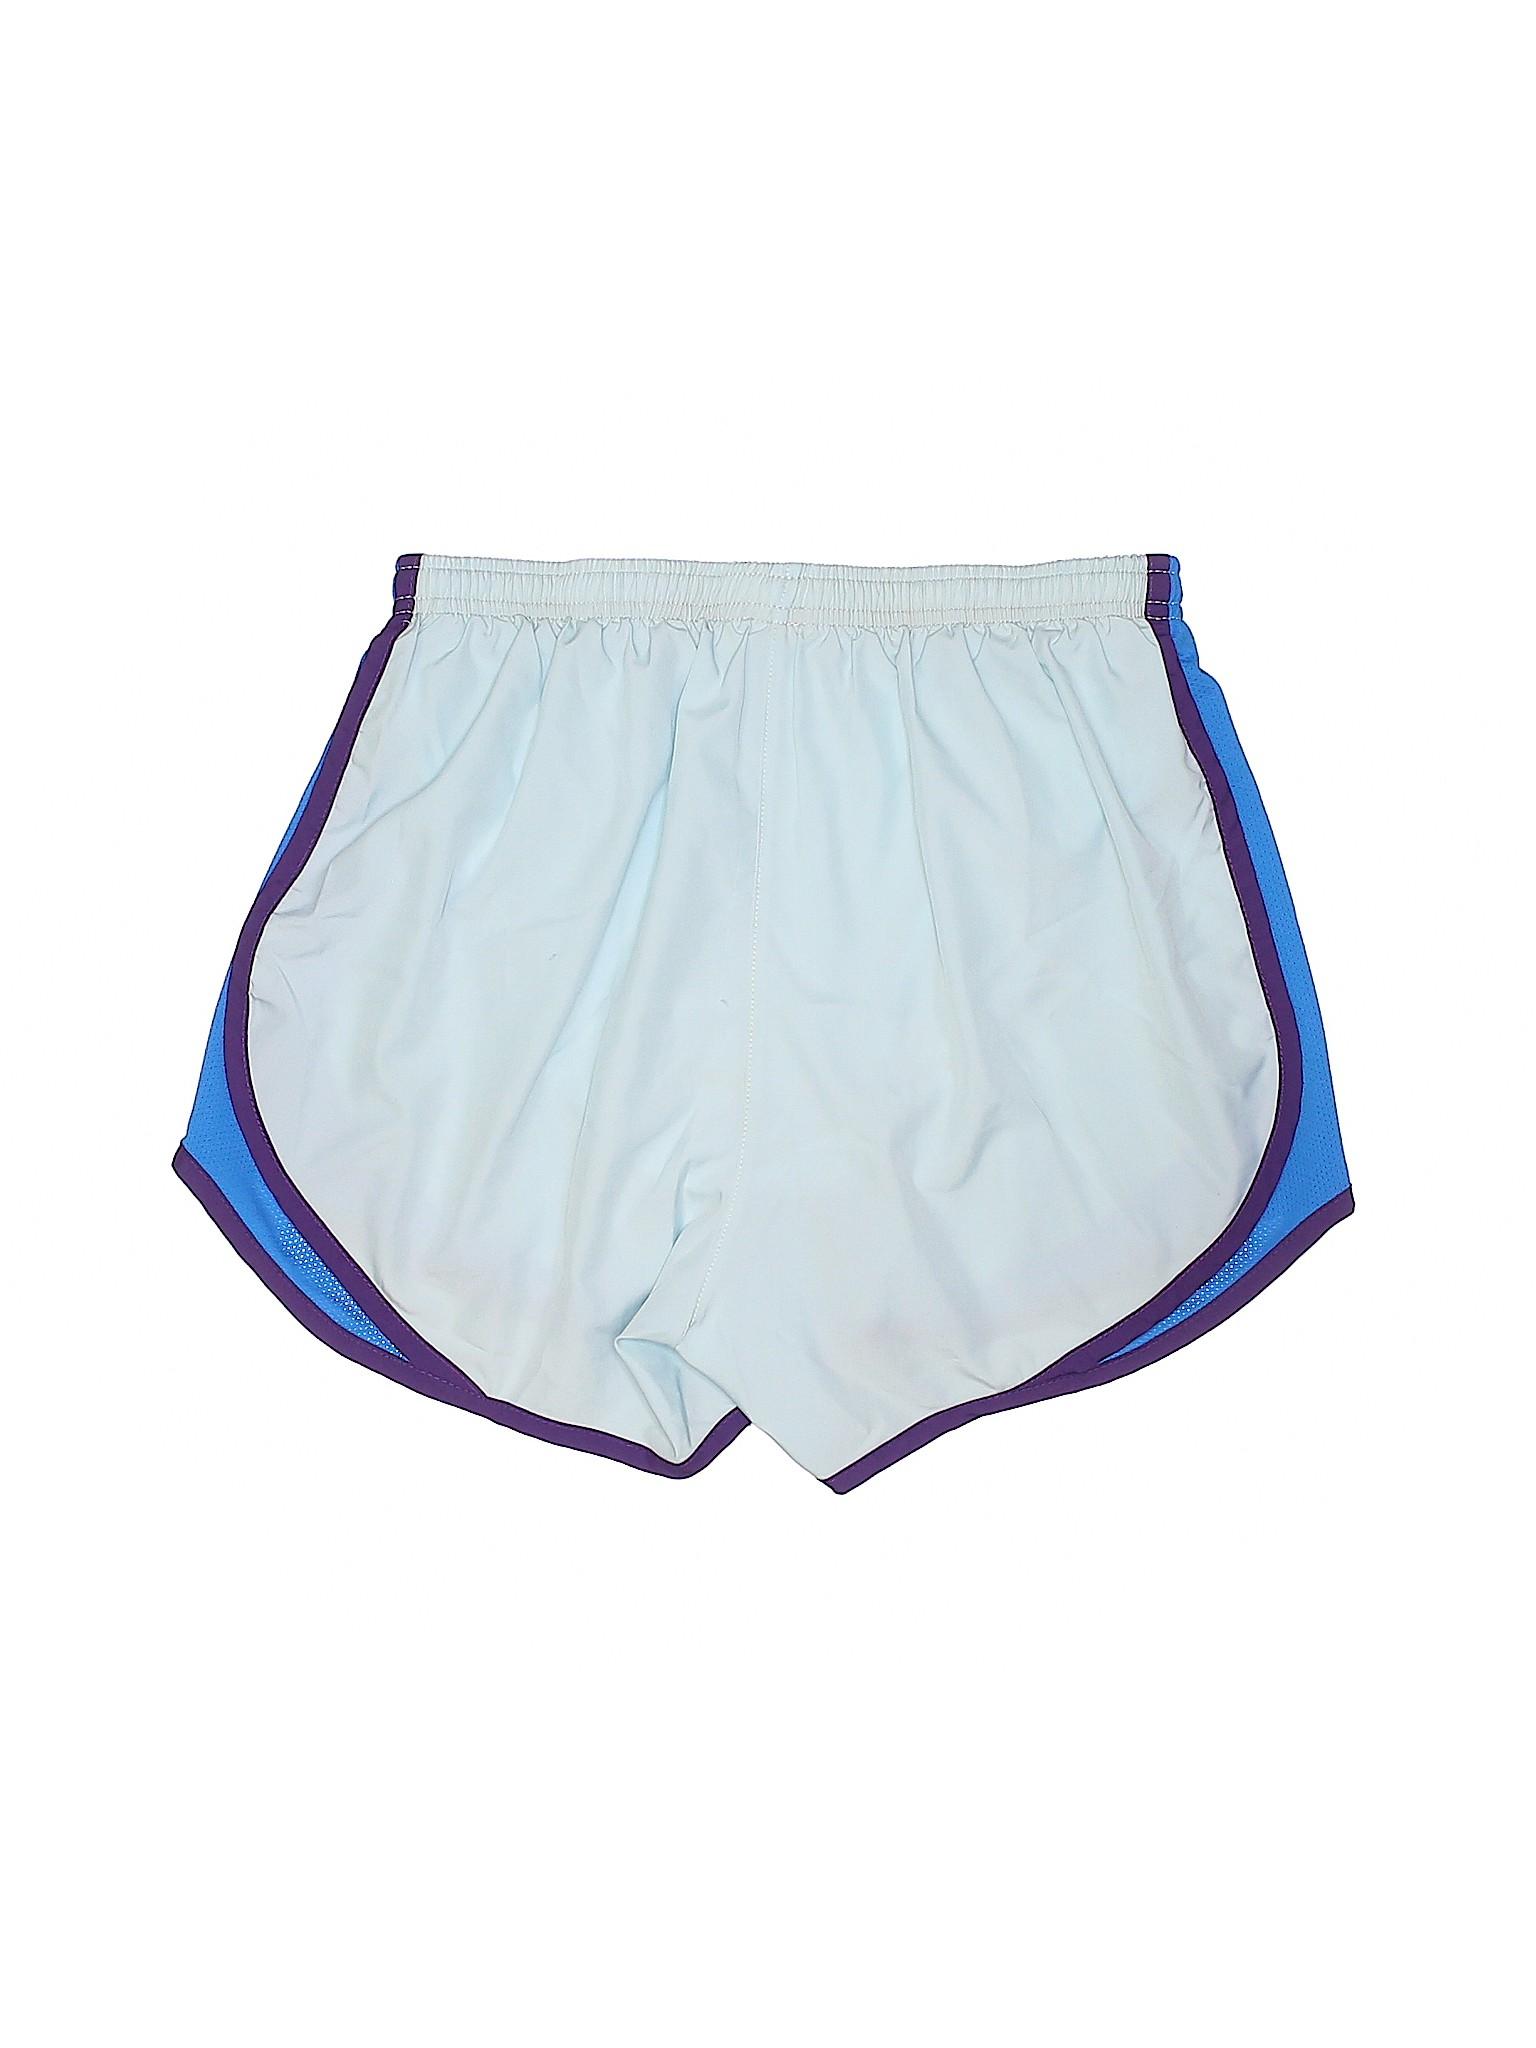 Shorts Nike Athletic Boutique Athletic Nike Boutique Shorts Zw0qTWCY